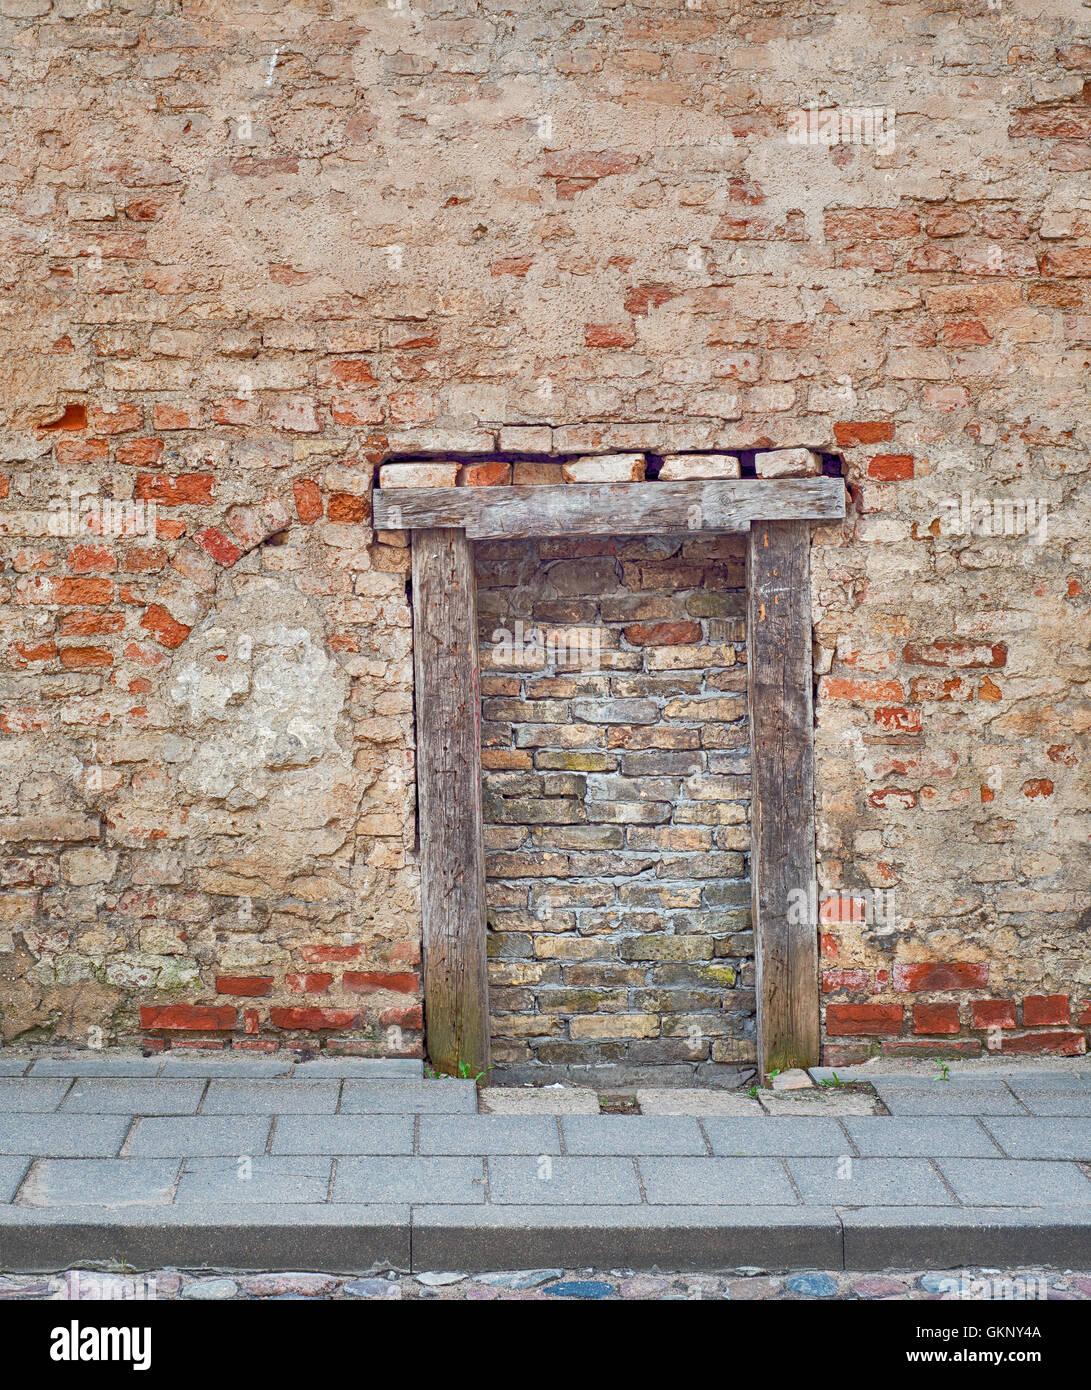 Cracked Brick Wall With Bricked Up Doorway Stock Photo Royalty Free Image 1